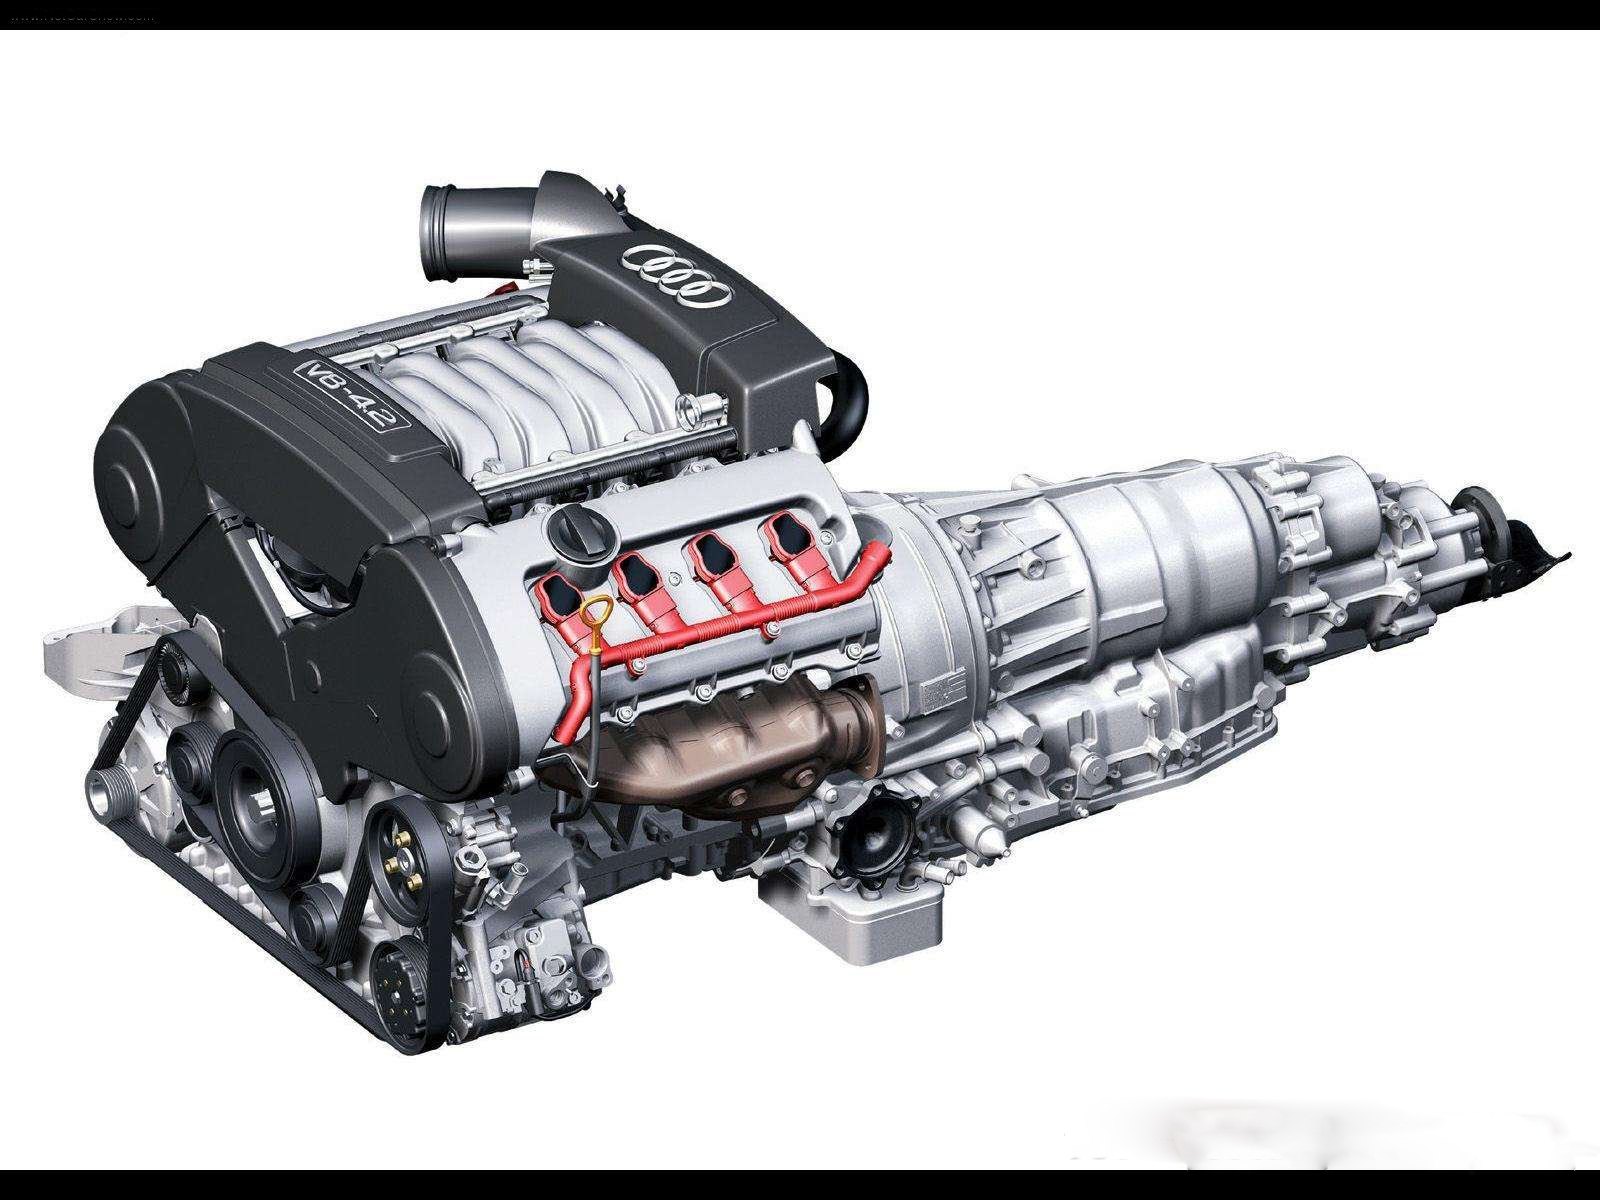 2010 Audi A8 Engine Diagram Transmission Car Wiring Diagrams 4 2 Schematic U2022 Rh Arcomics Co A4